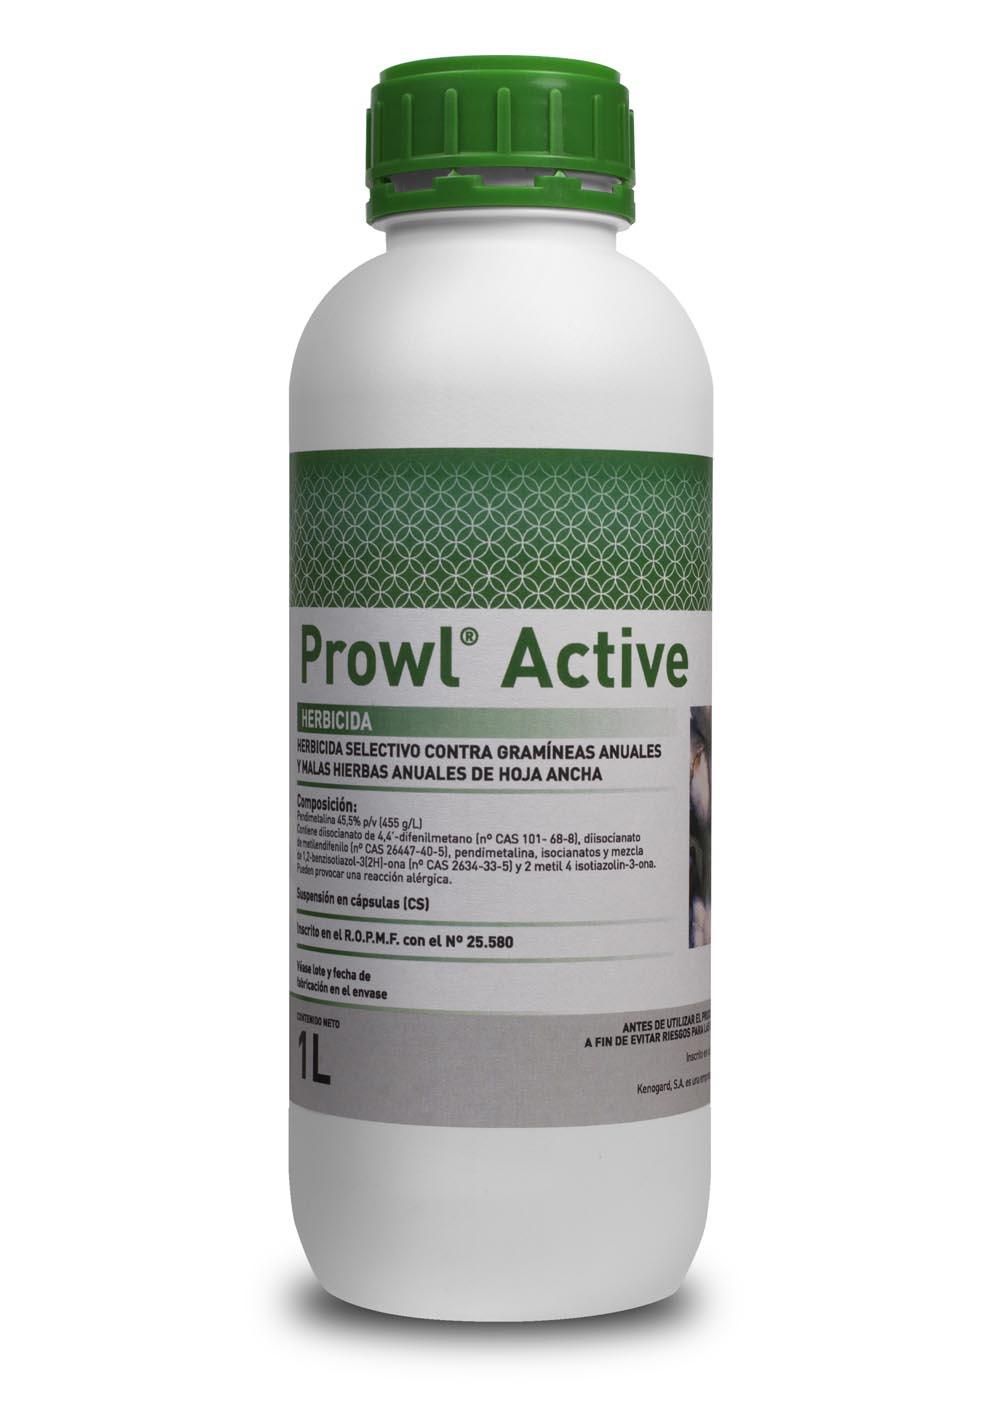 Prowl Active 1 L